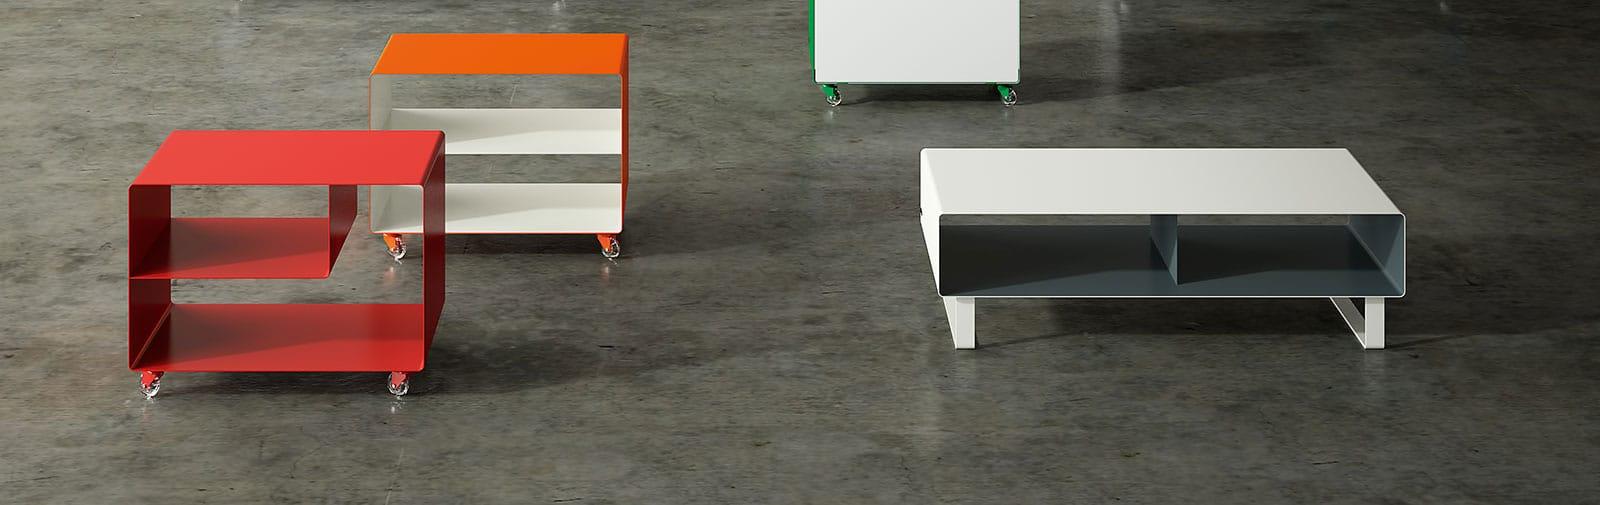 Tv Meubel Design.Tv Meubel R 106n Muller Design Interieurhof Alkmaar